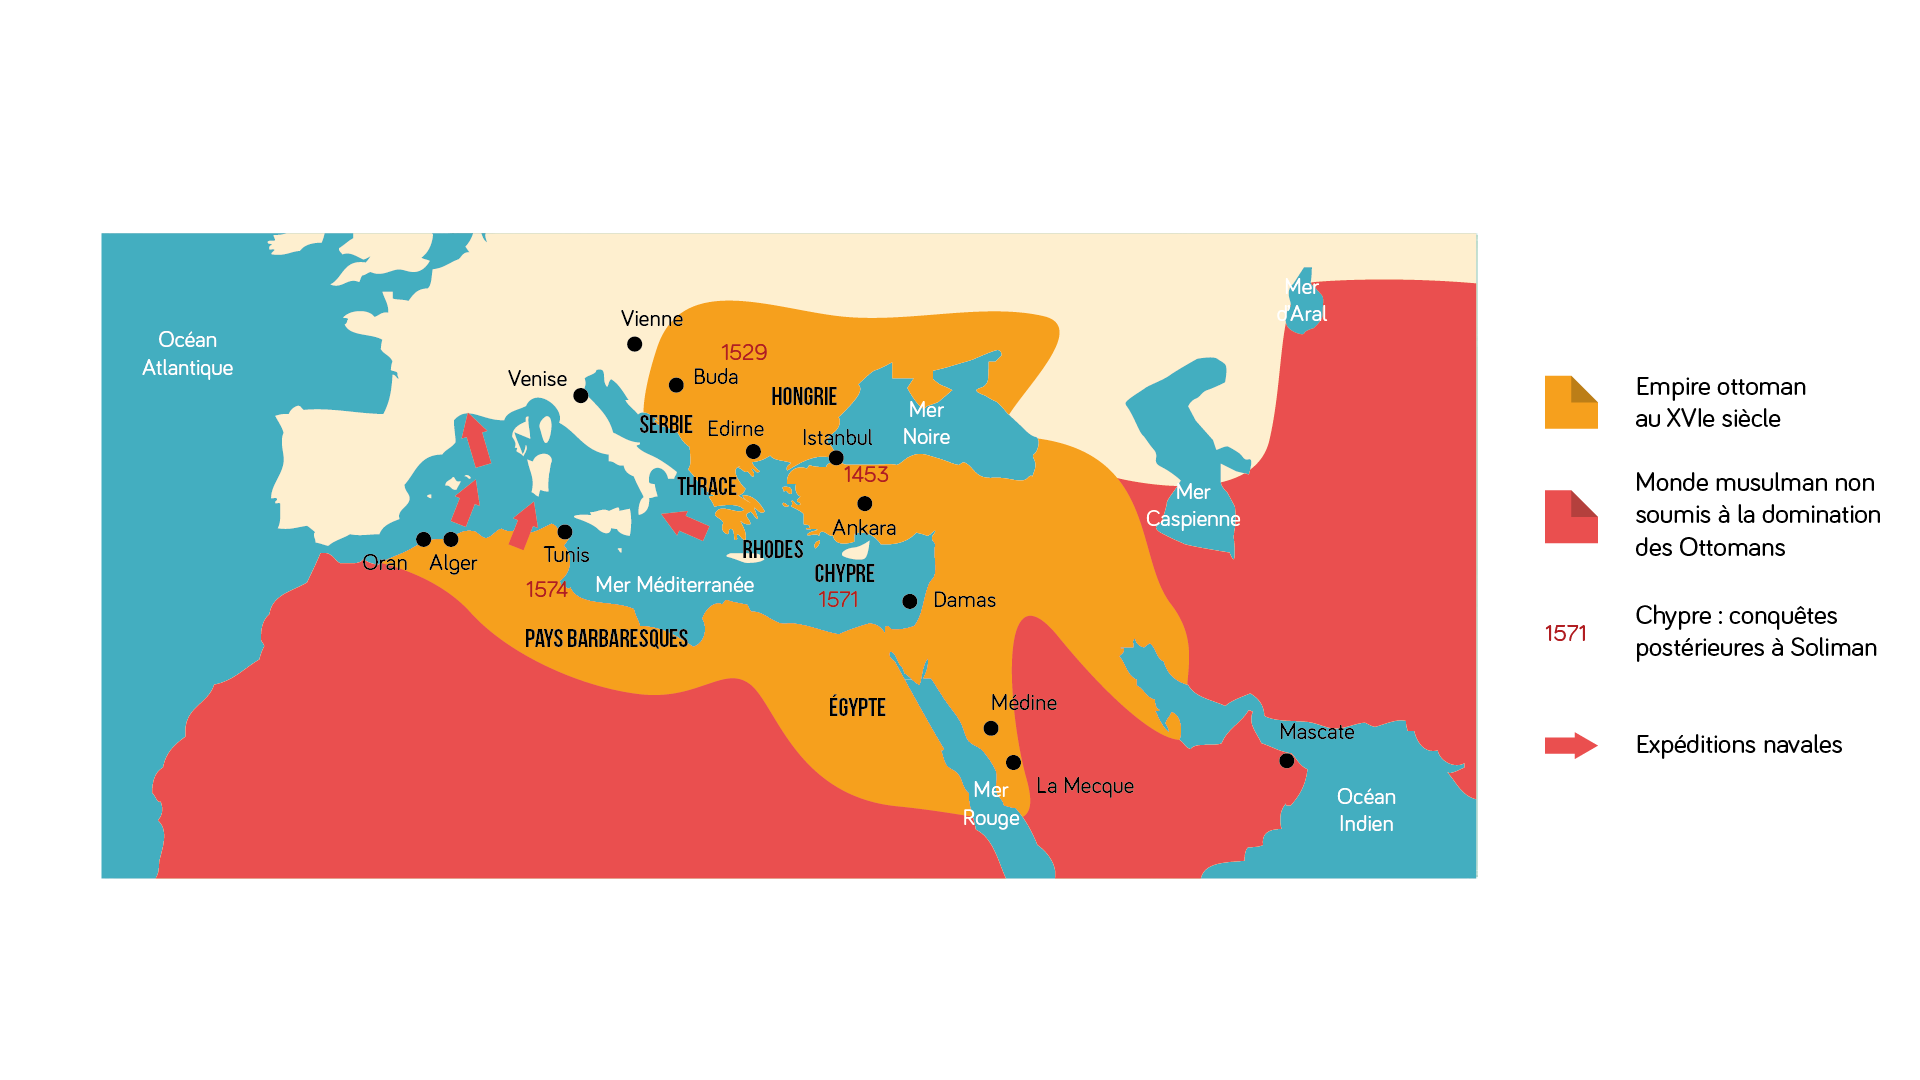 L'empire ottoman au XVI<sup>e</sup>siècle